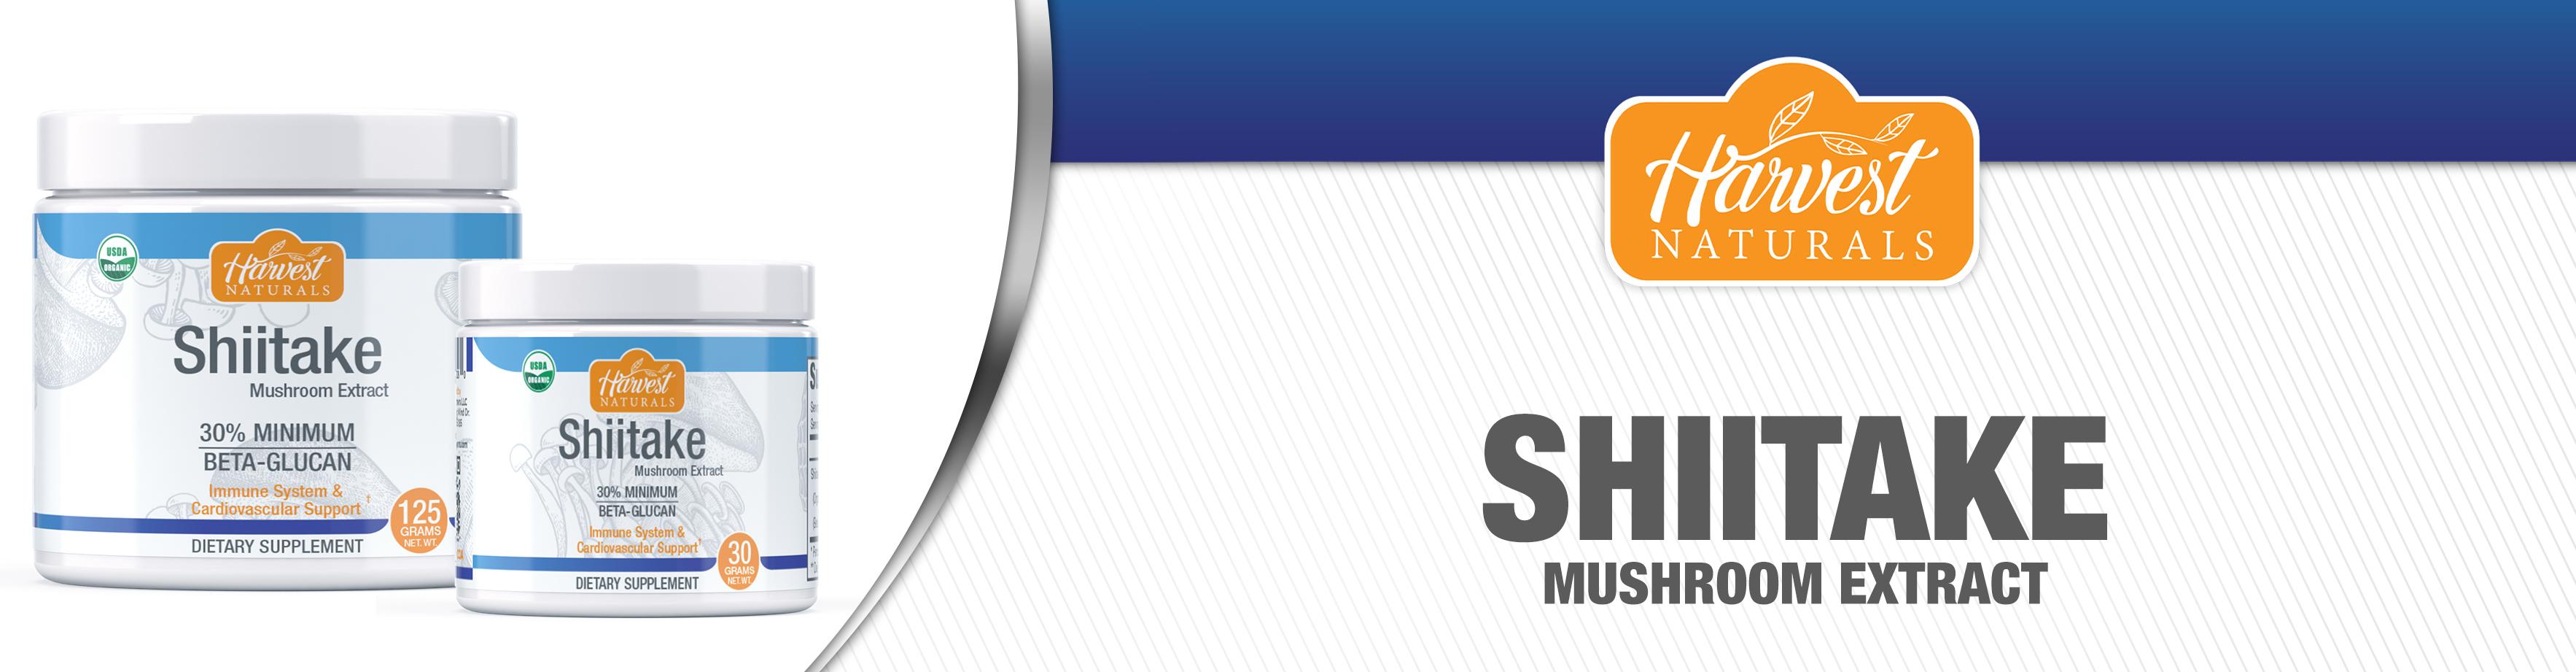 shiitake-powder-10-21.jpg